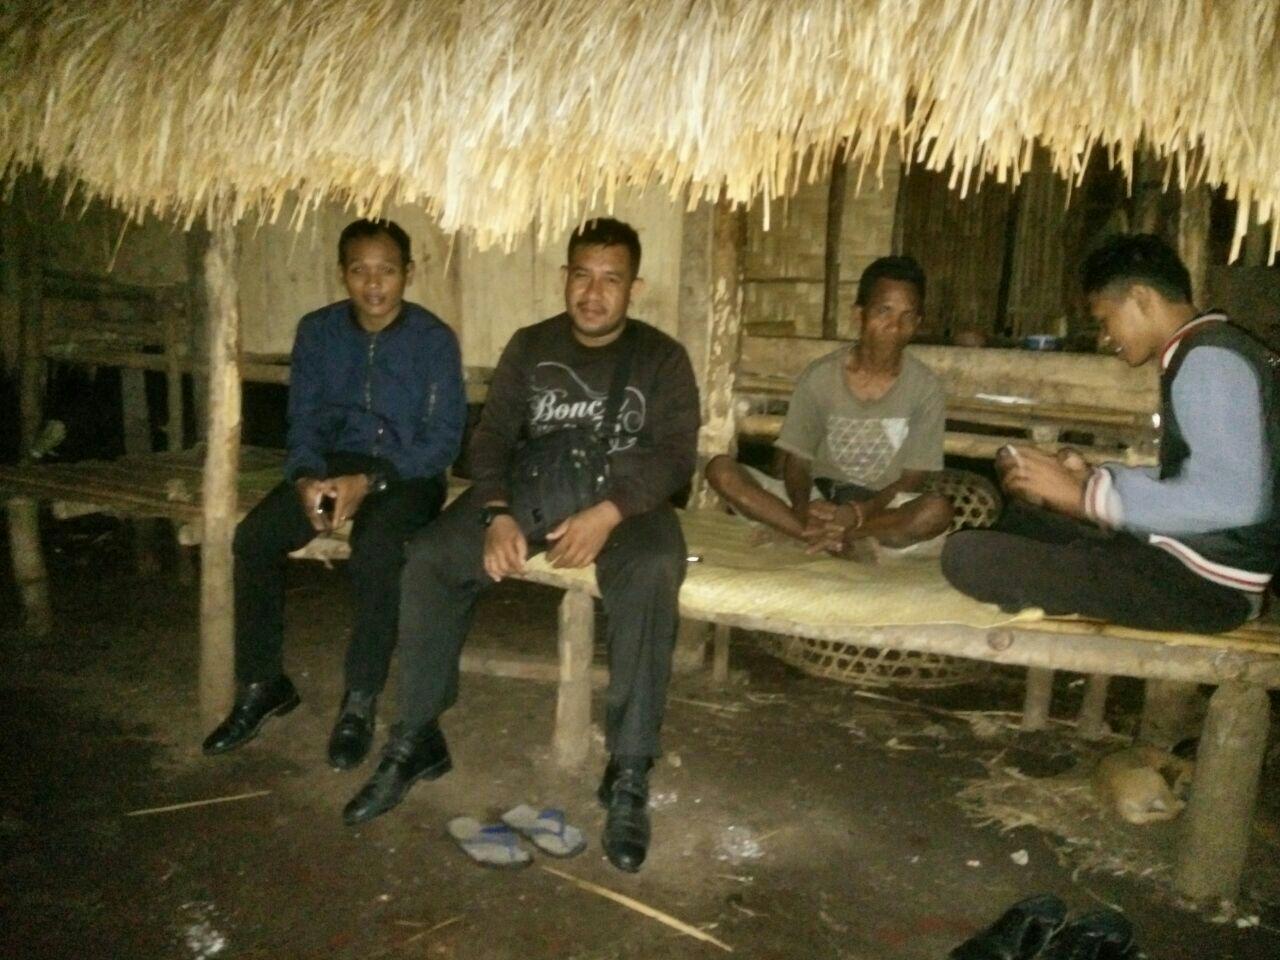 Polsek Kodi Bangedo | Patroli dan Sambang Warga Menjadi Keseharian